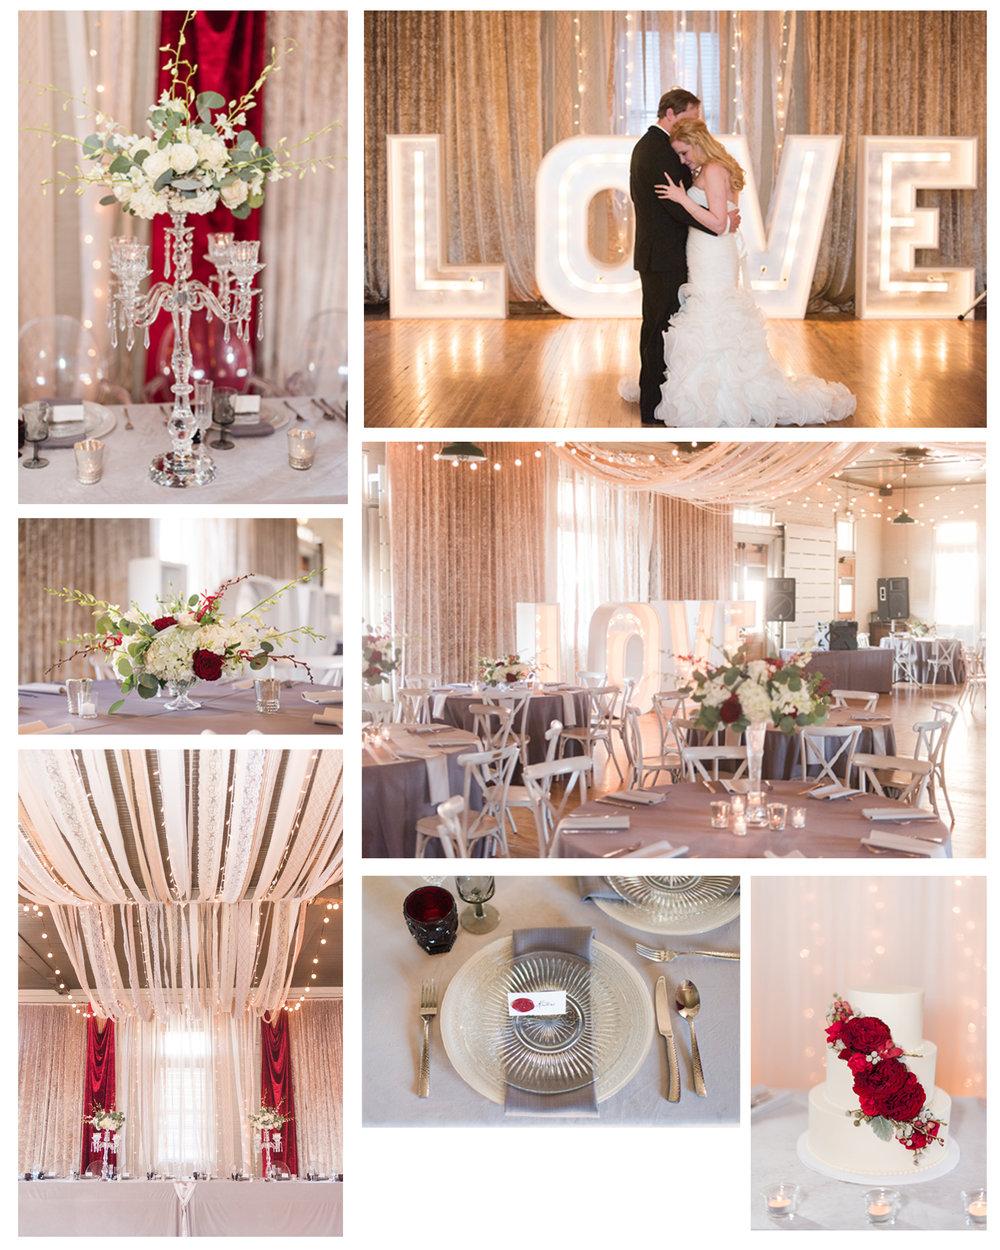 Meghan+Daniel - Romantic Wedding Reception details.jpg